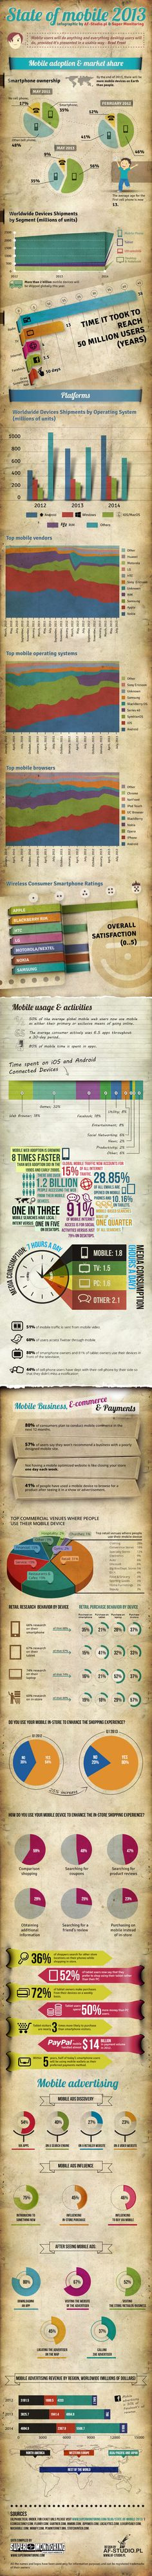 Infographic-2013-Mobile-Growth-Statistics-Medium